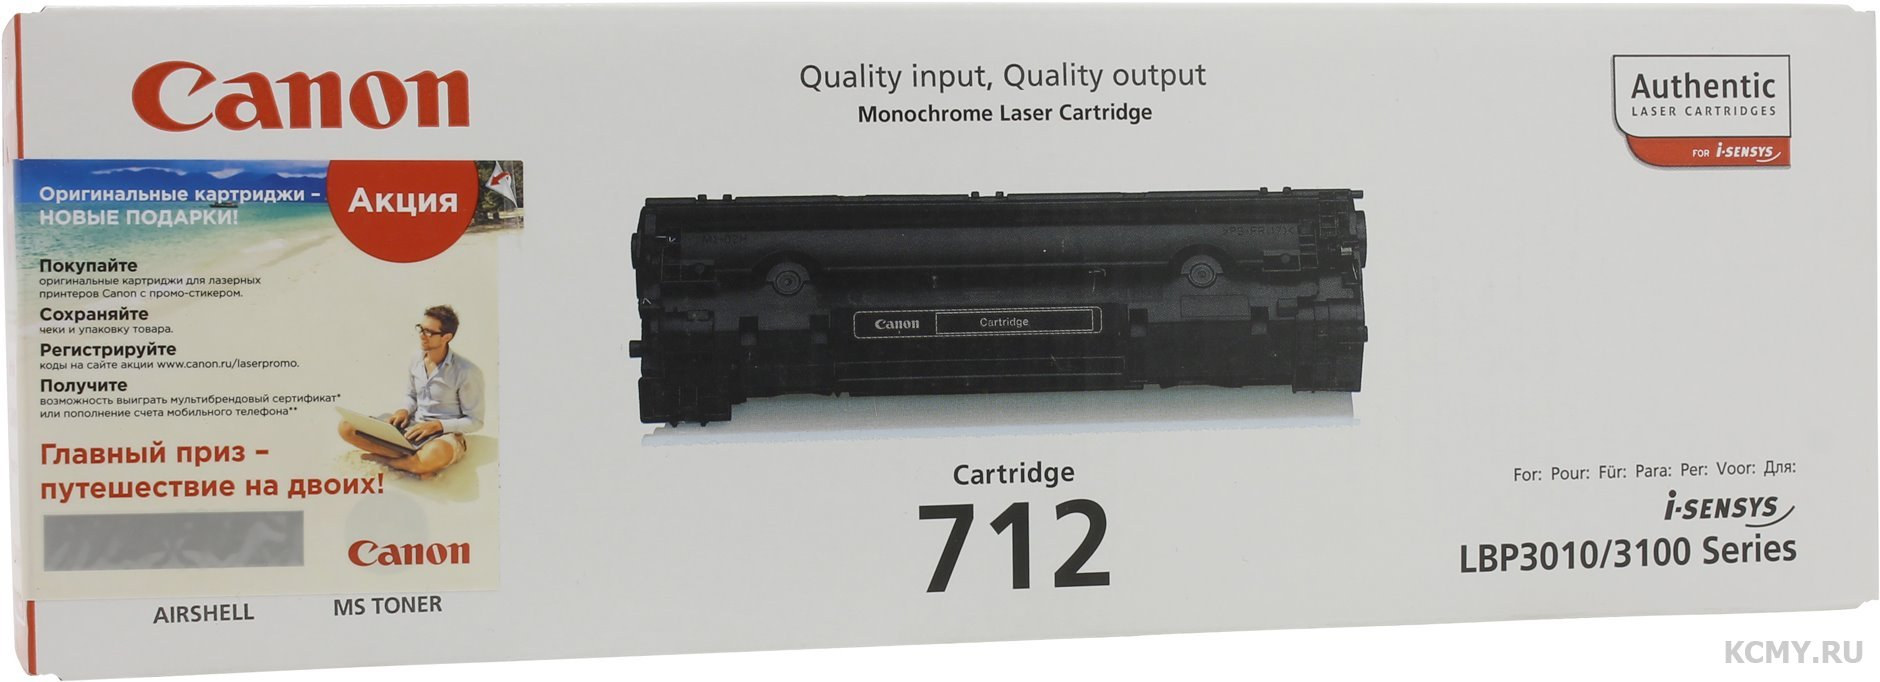 Canon Cartridge 712